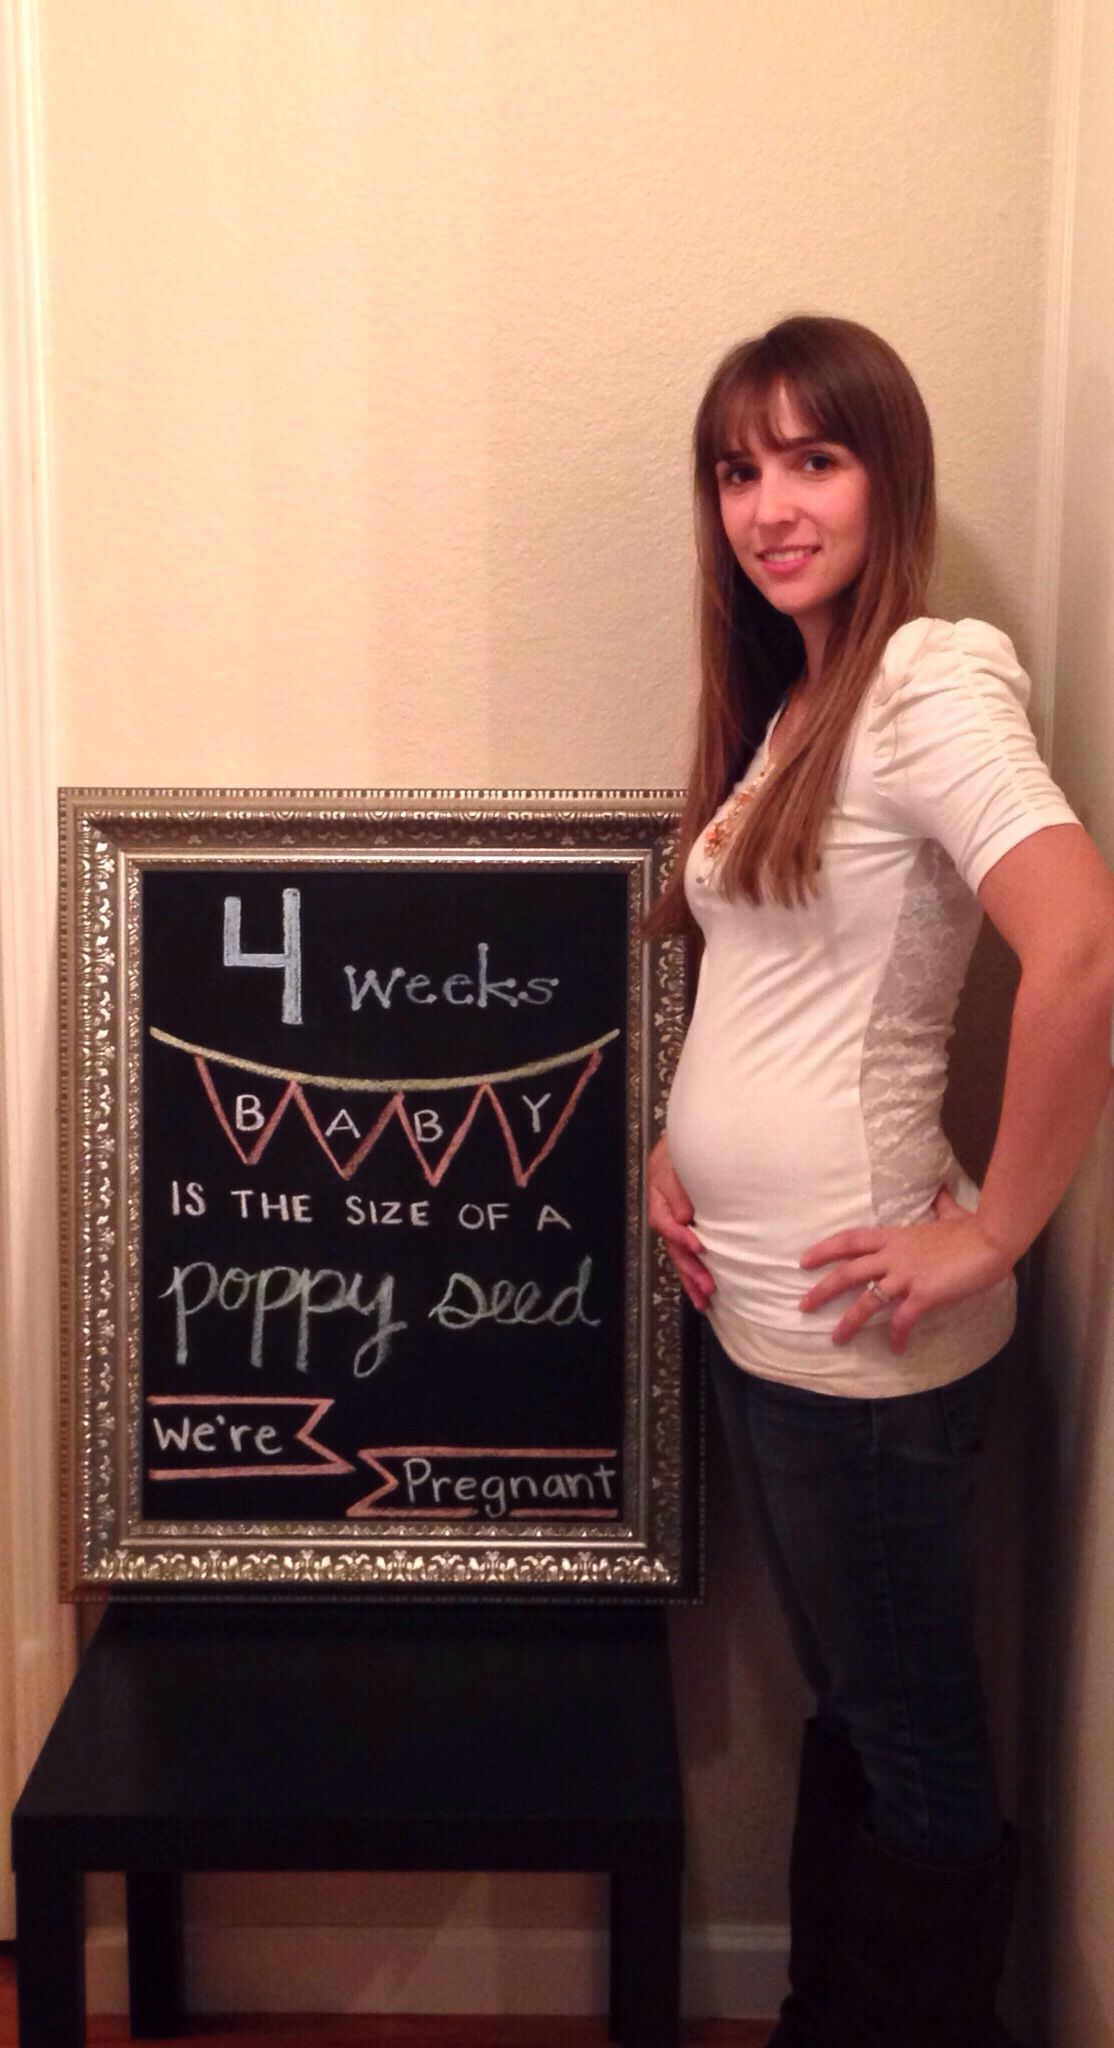 4 week baby bump | Pregnancy | Pinterest | Baby bumps ...